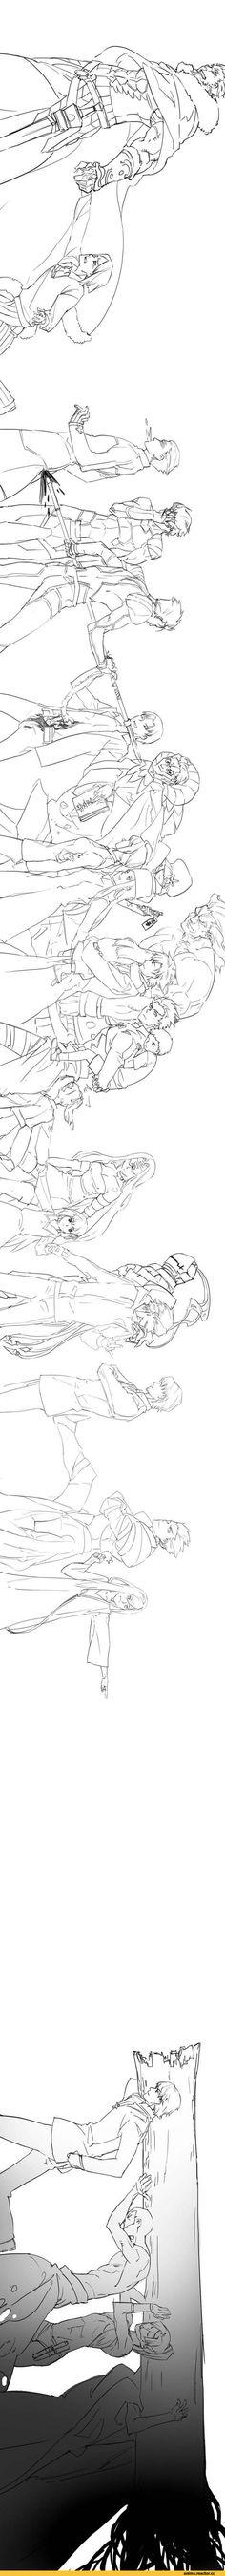 Anime,аниме,Fate (series),Fate (srs),Fate/Zero,Fate/stay night,Saber (Fate),Rider (Fate/Zero),Lancer (Fate Zero),Lancer (Fate/stay night),Caster (Fate/Zero),Caster (Fate/stay night),Berserker (Fate/Zero),Berserker (Fate/stay night),Archer (Fate/stay night),Gilgamesh (Fate),Waver Velvet,Kayneth